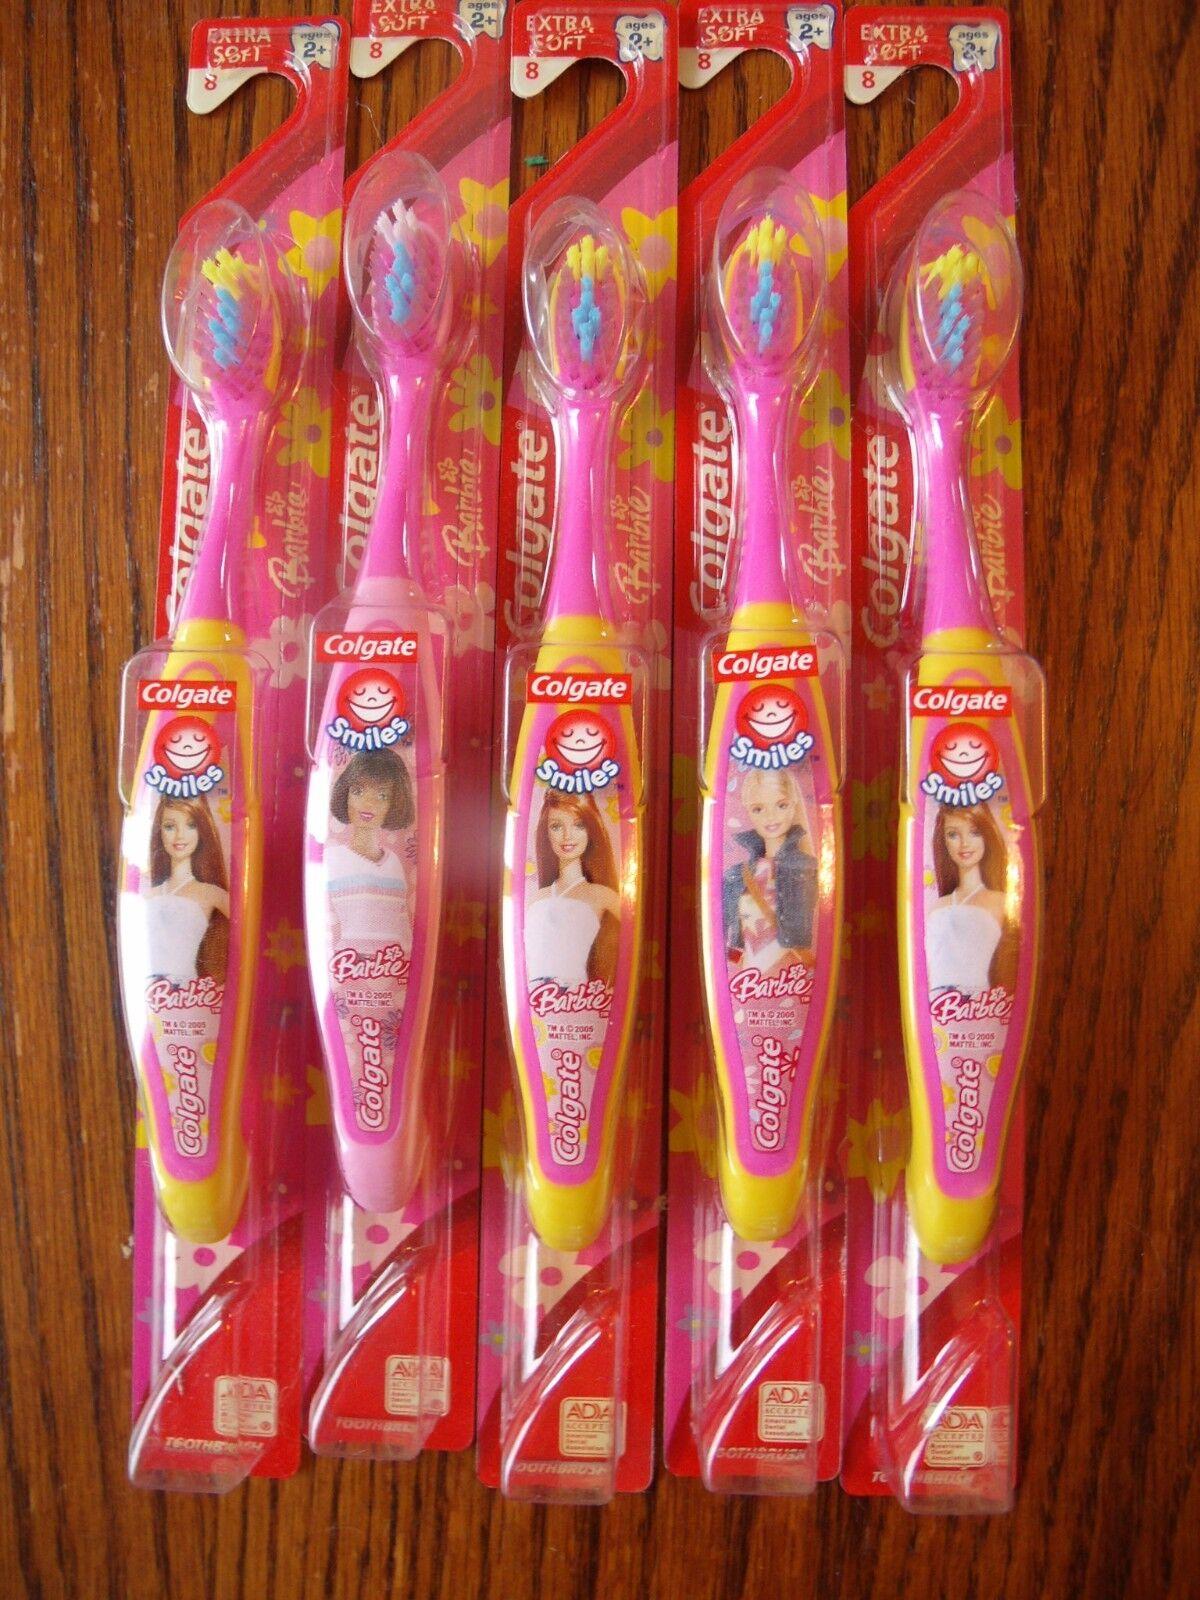 Barbie Toothbrush- One Random Toothbrush will be sent-Great Stocking Stuffer